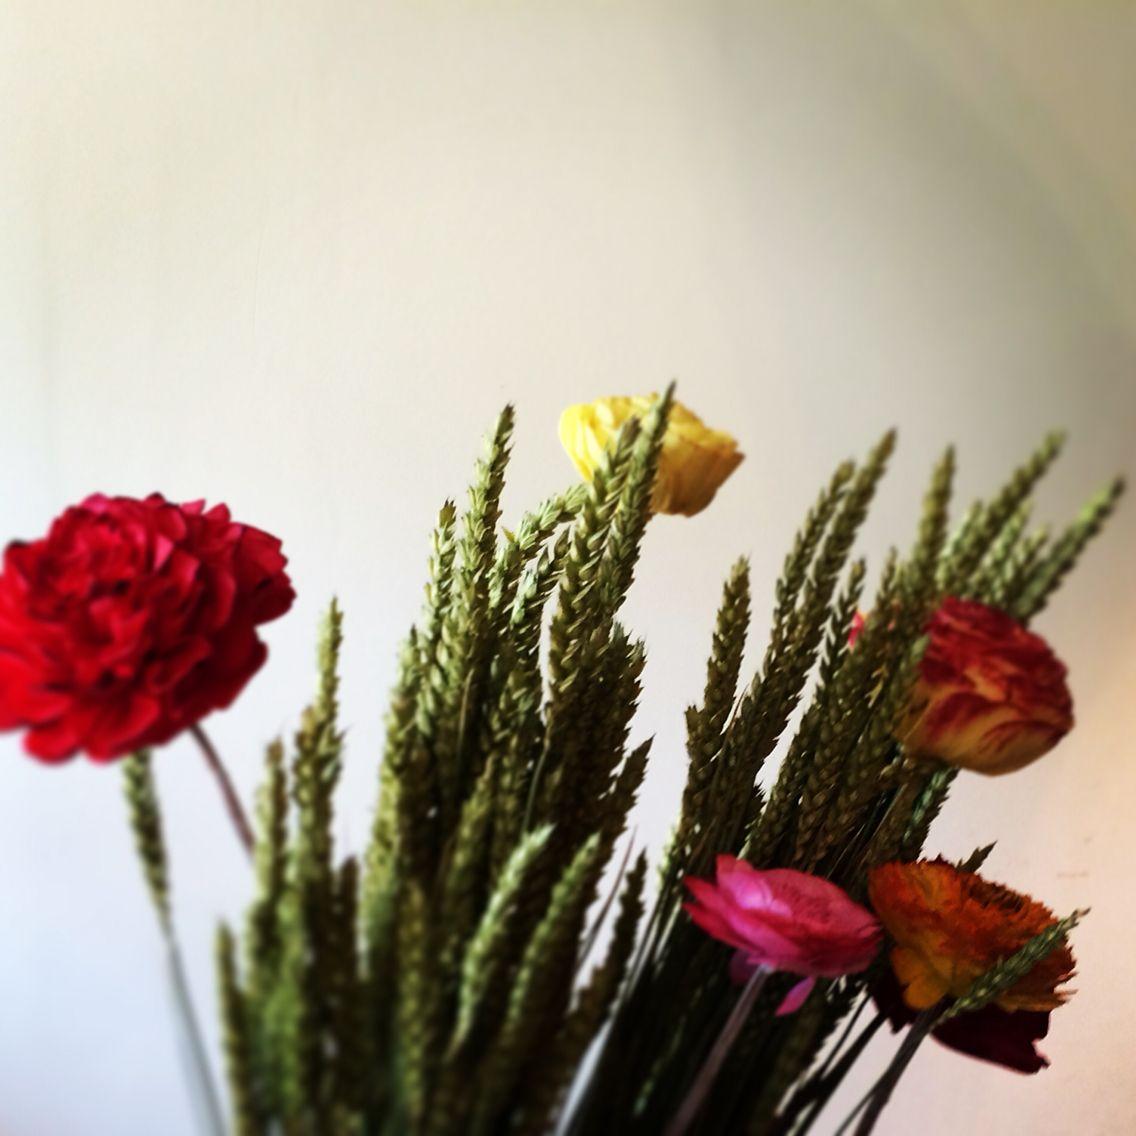 Unreel but enjoyable #bloomsstore #dryflowers #interiordecoration